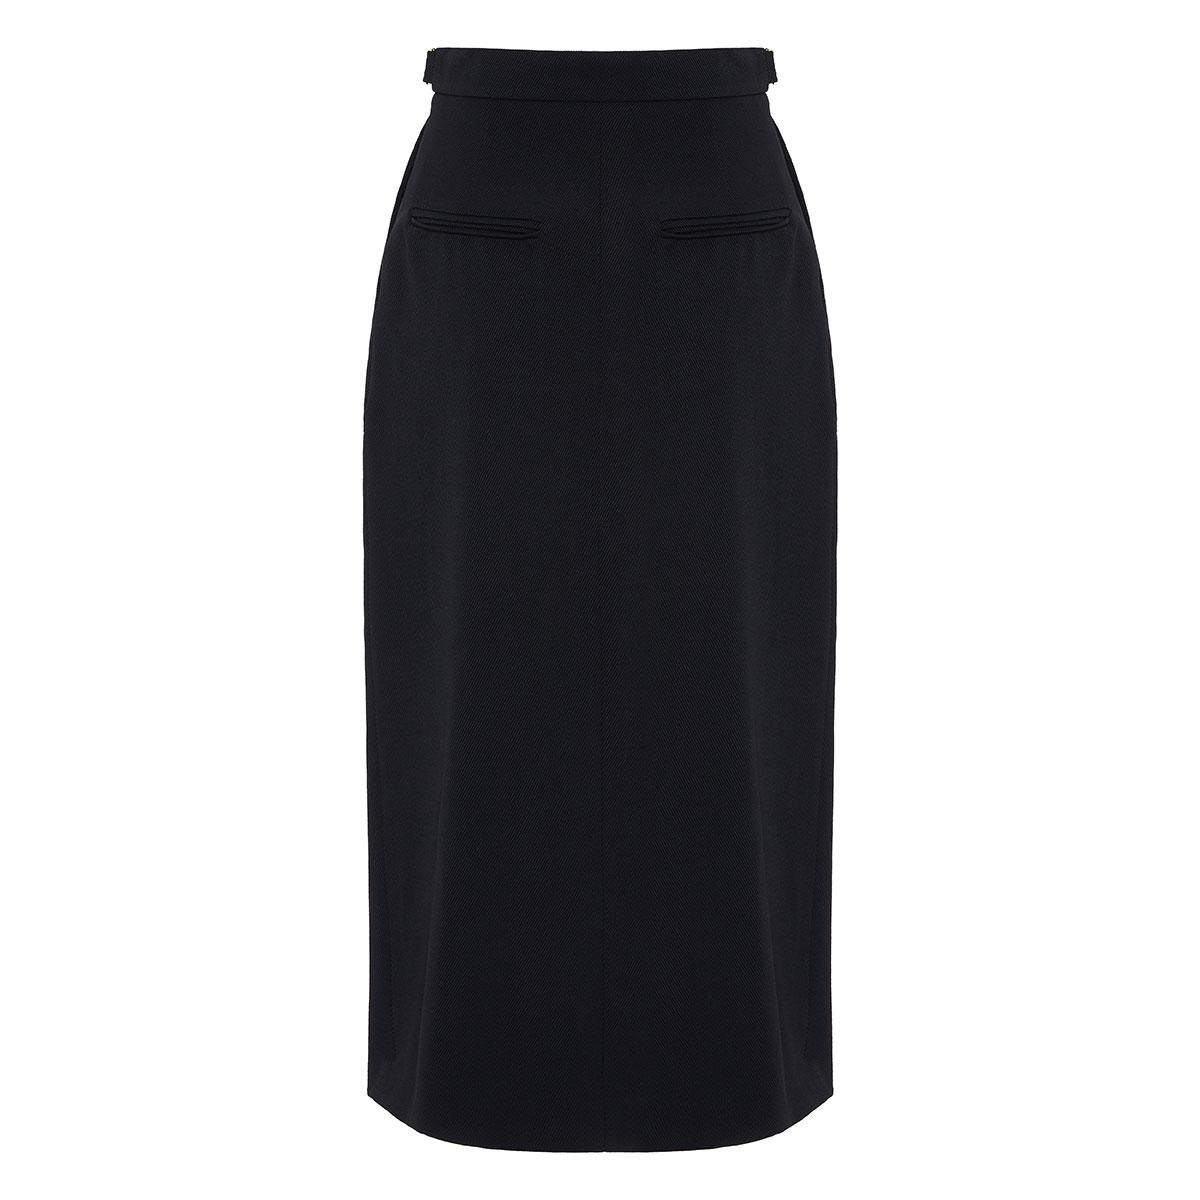 Wool gabardine pencil skirt